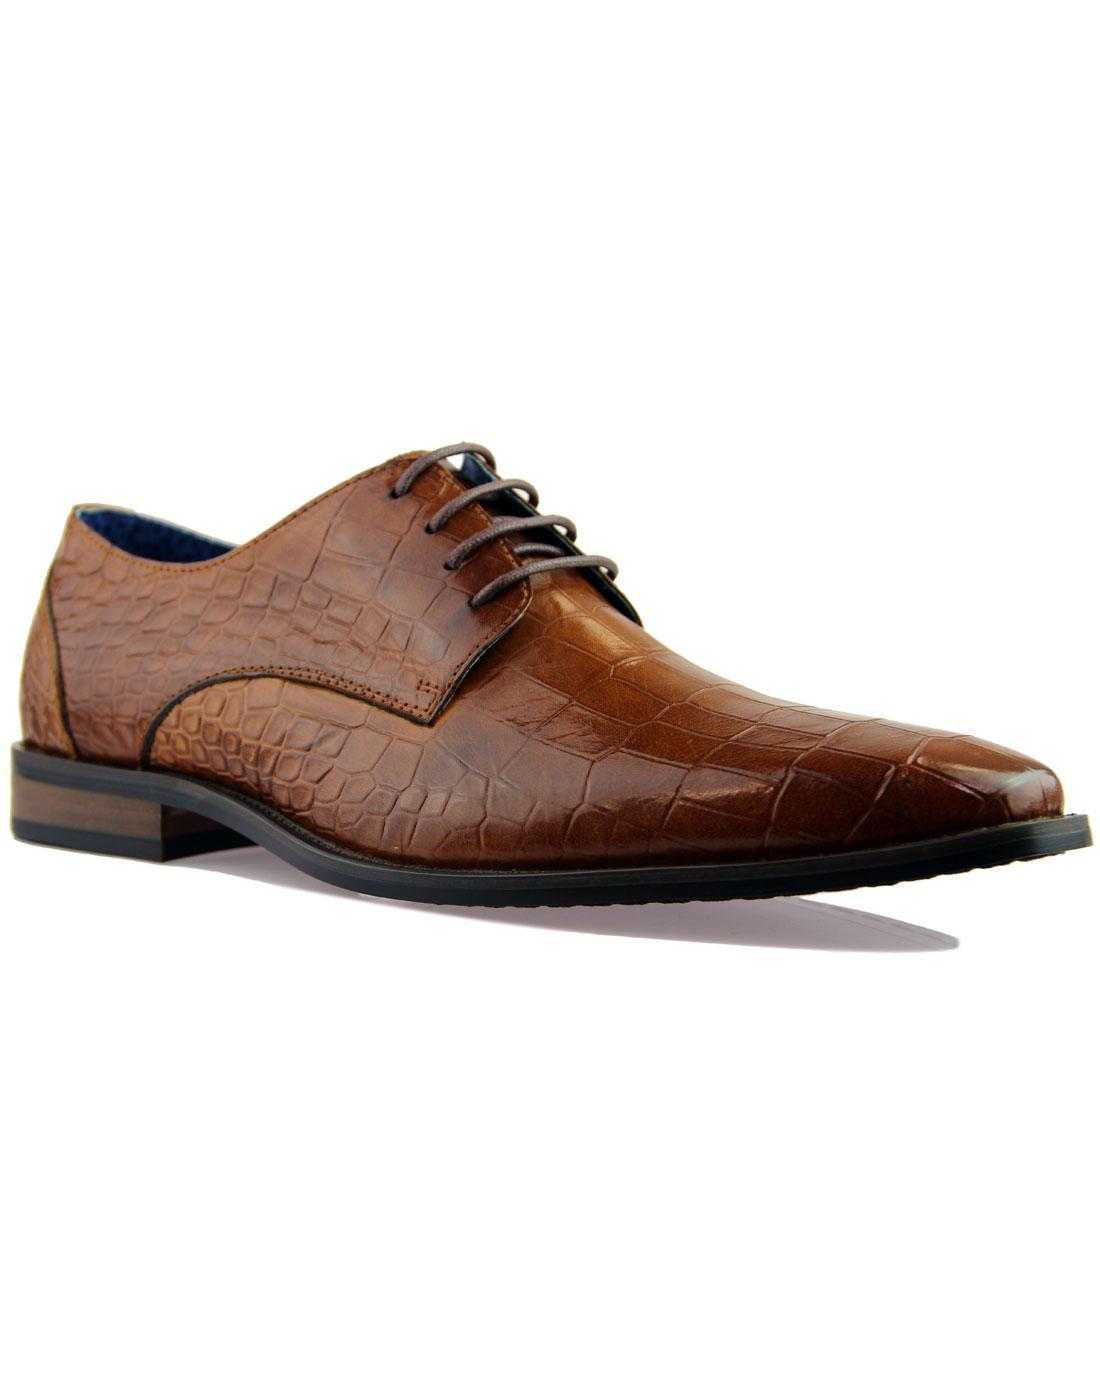 Teilo PAOLO VANDINI Croc Stamp Chisel Toe Shoes T